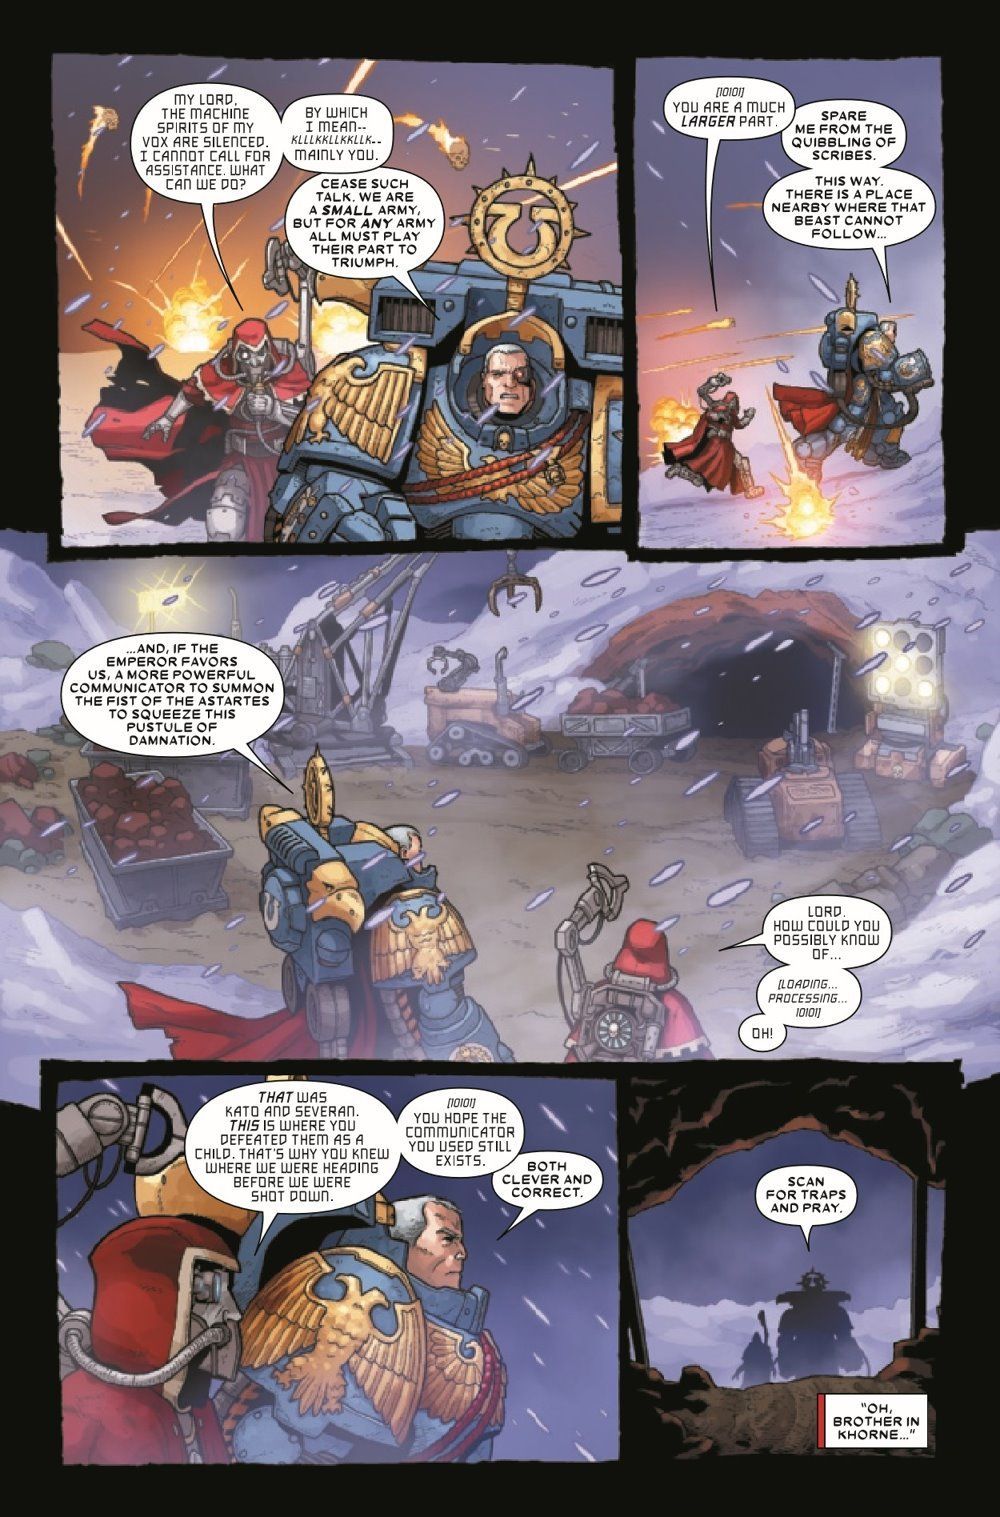 WARHAMMERMC2020005_Preview-6 ComicList Previews: WARHAMMER 40000 MARNEUS CALGAR #5 (OF 5)